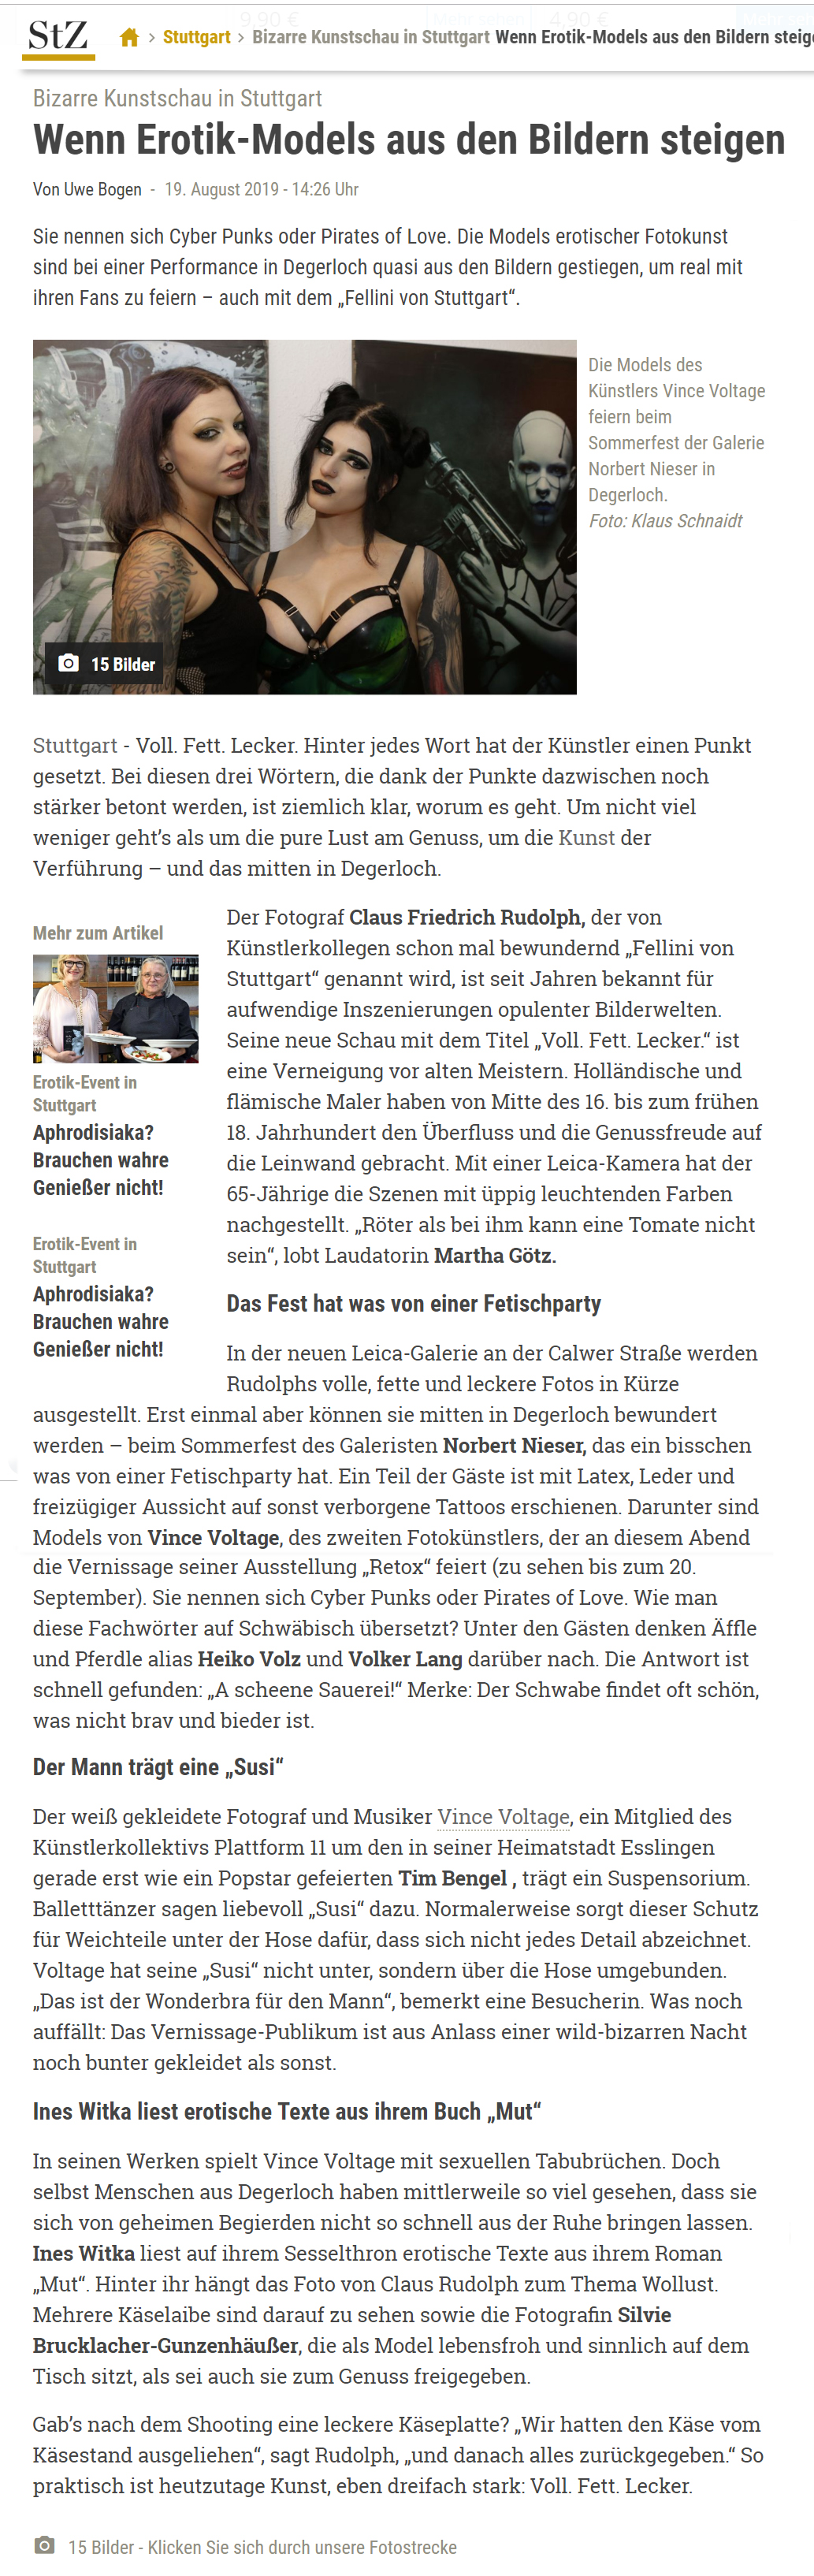 Stuttgarter Zeitung 20. August 2019